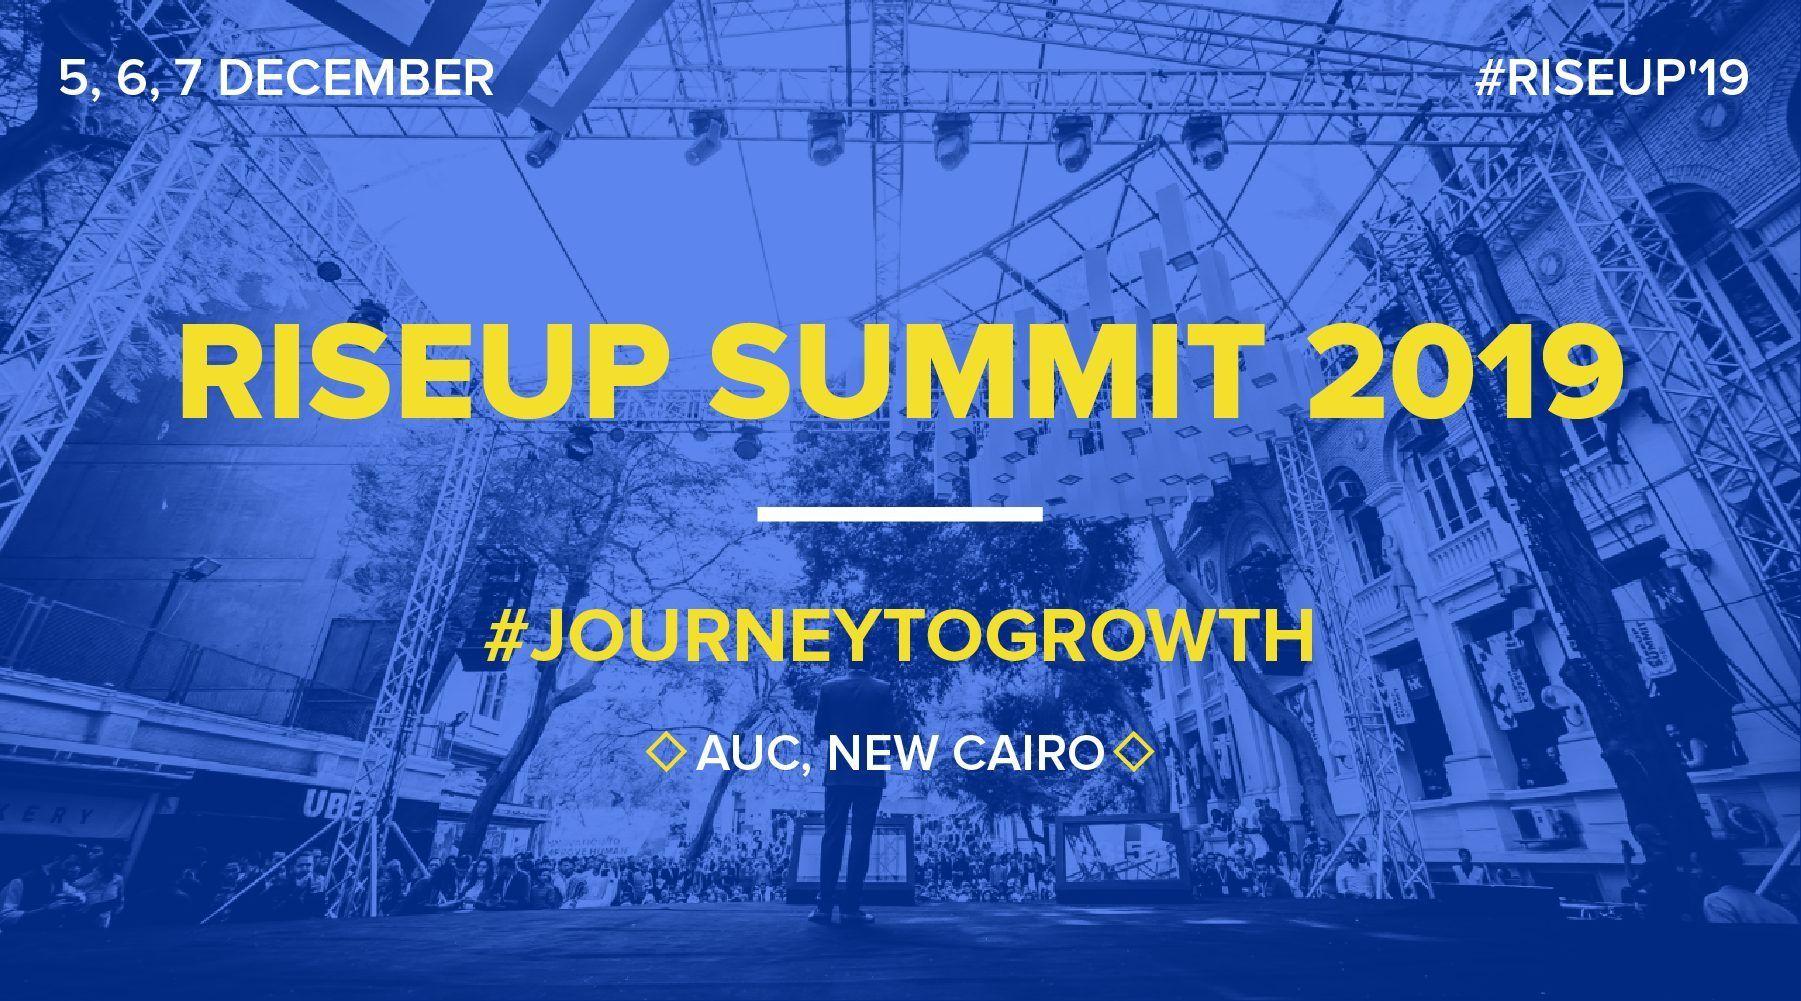 RiseUp Summit 2019